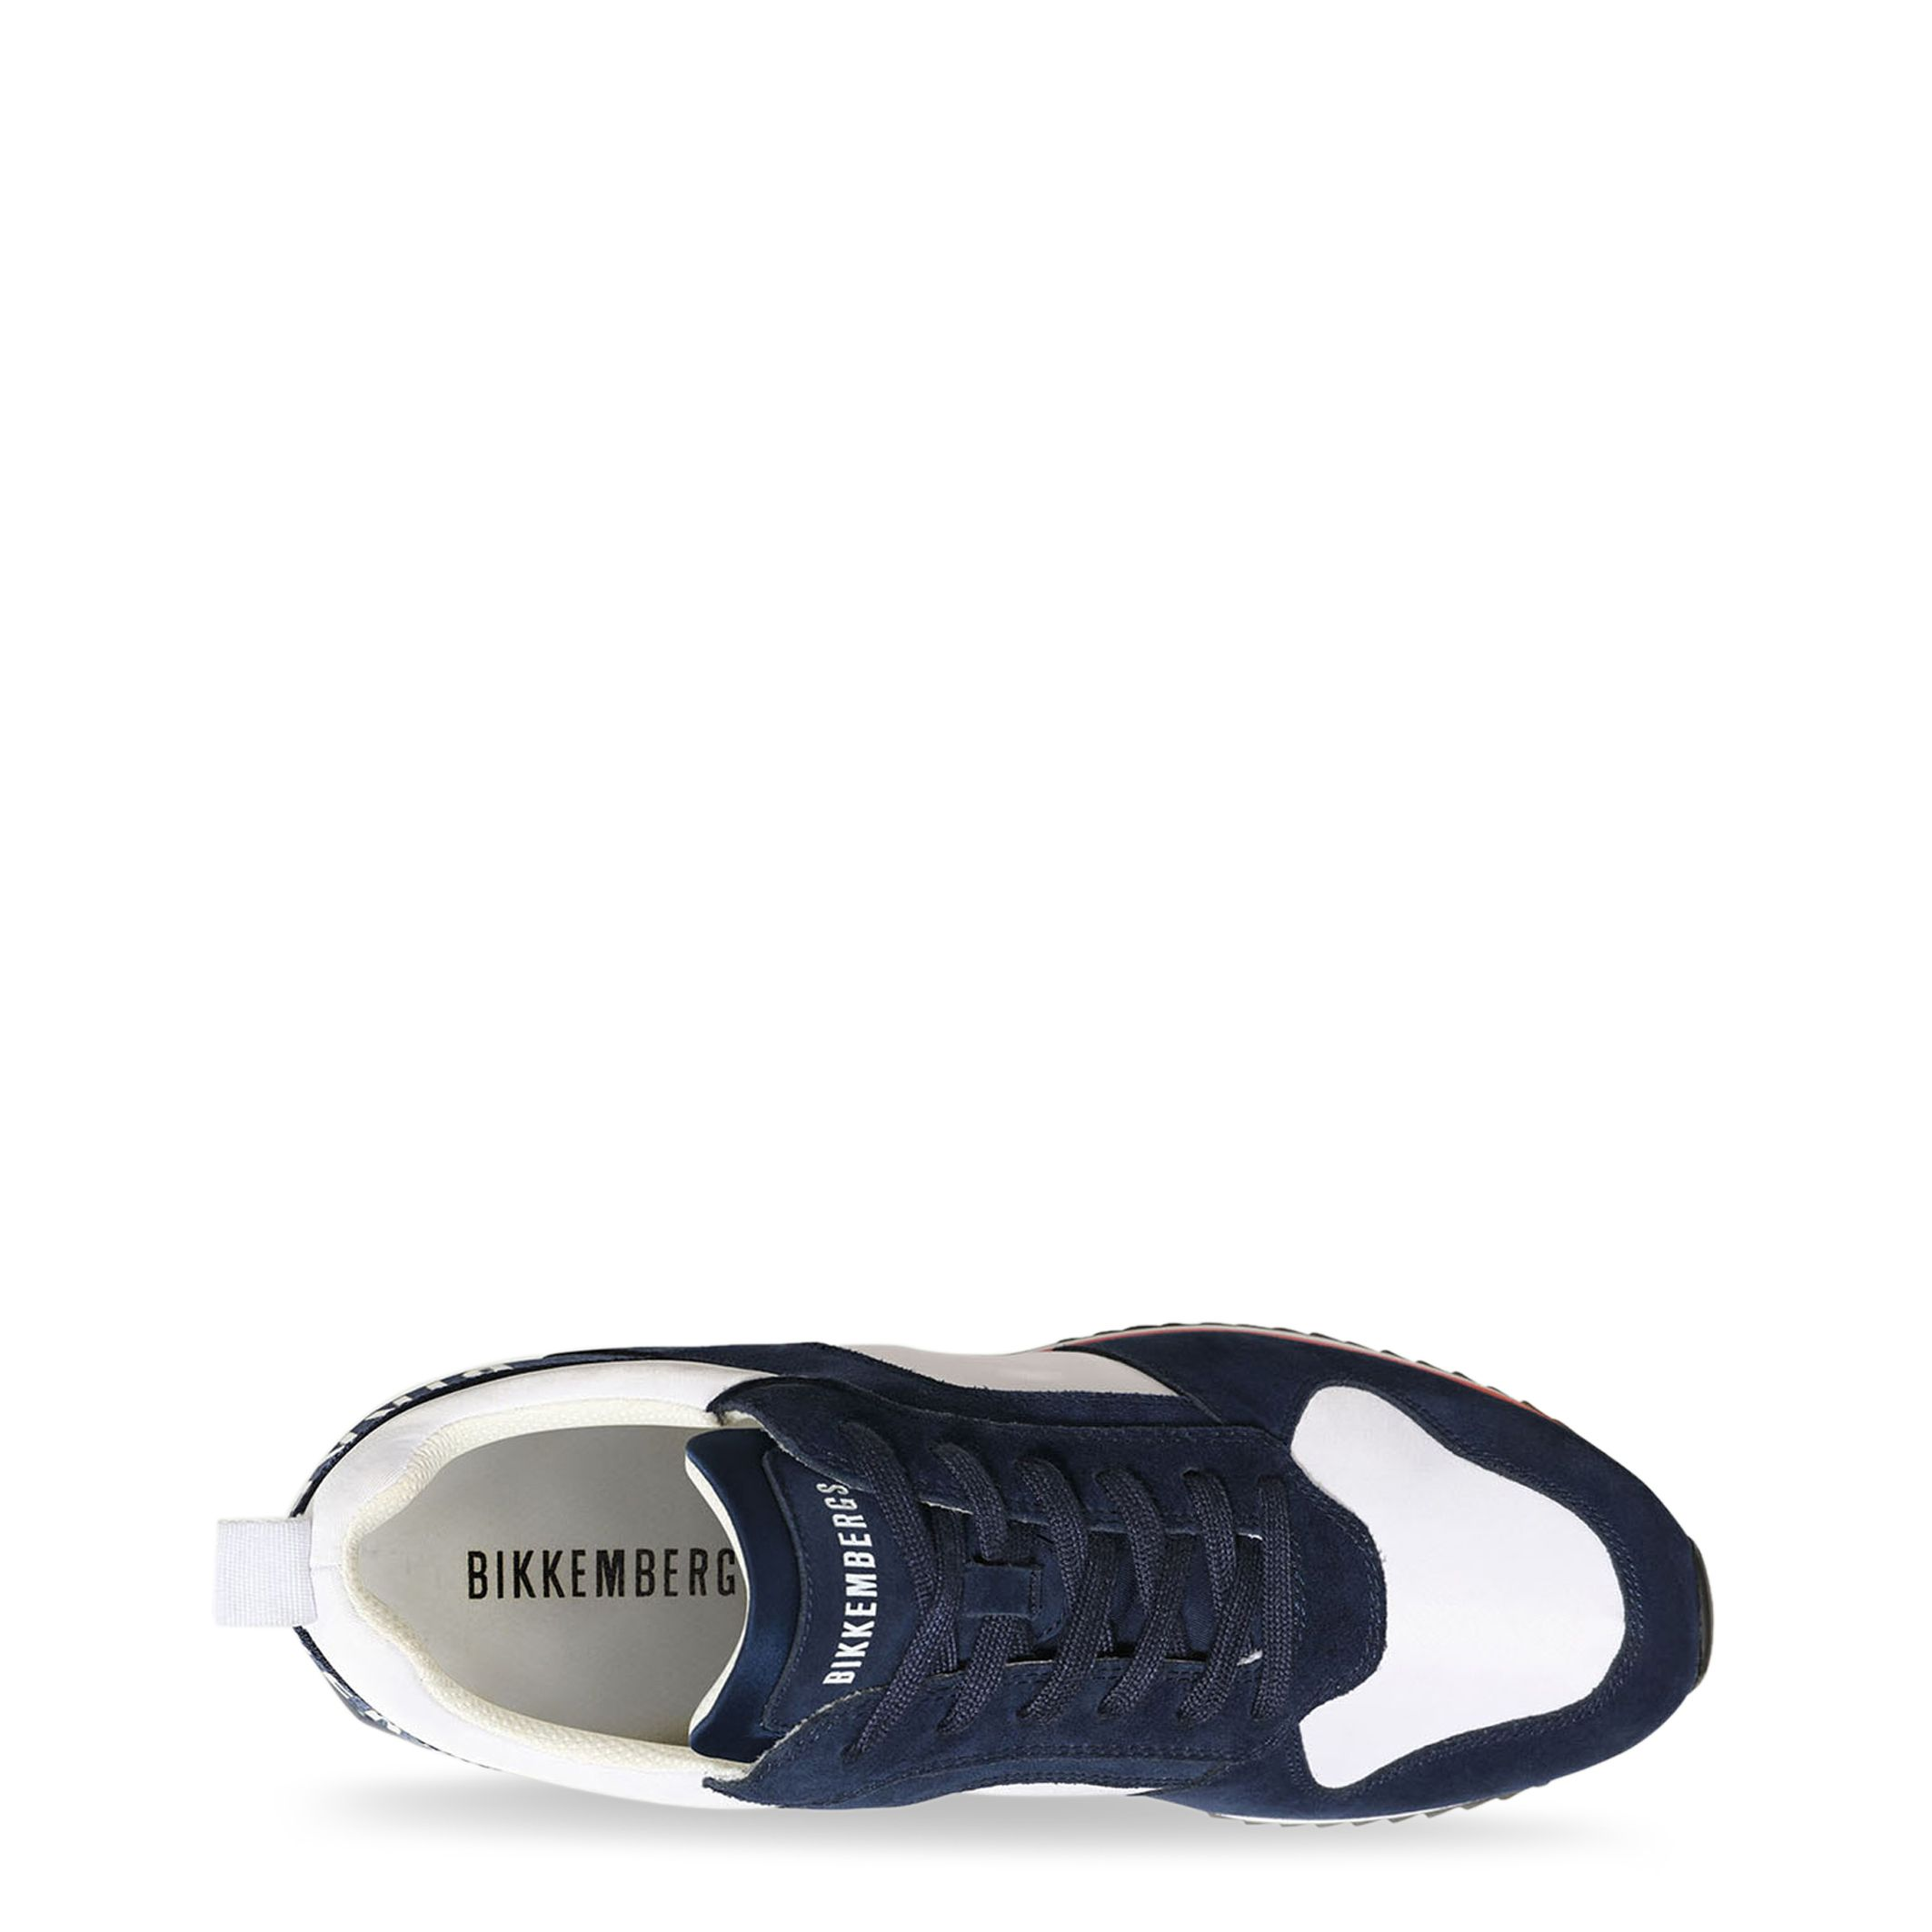 Sneakers Bikkembergs – B4BKW0040